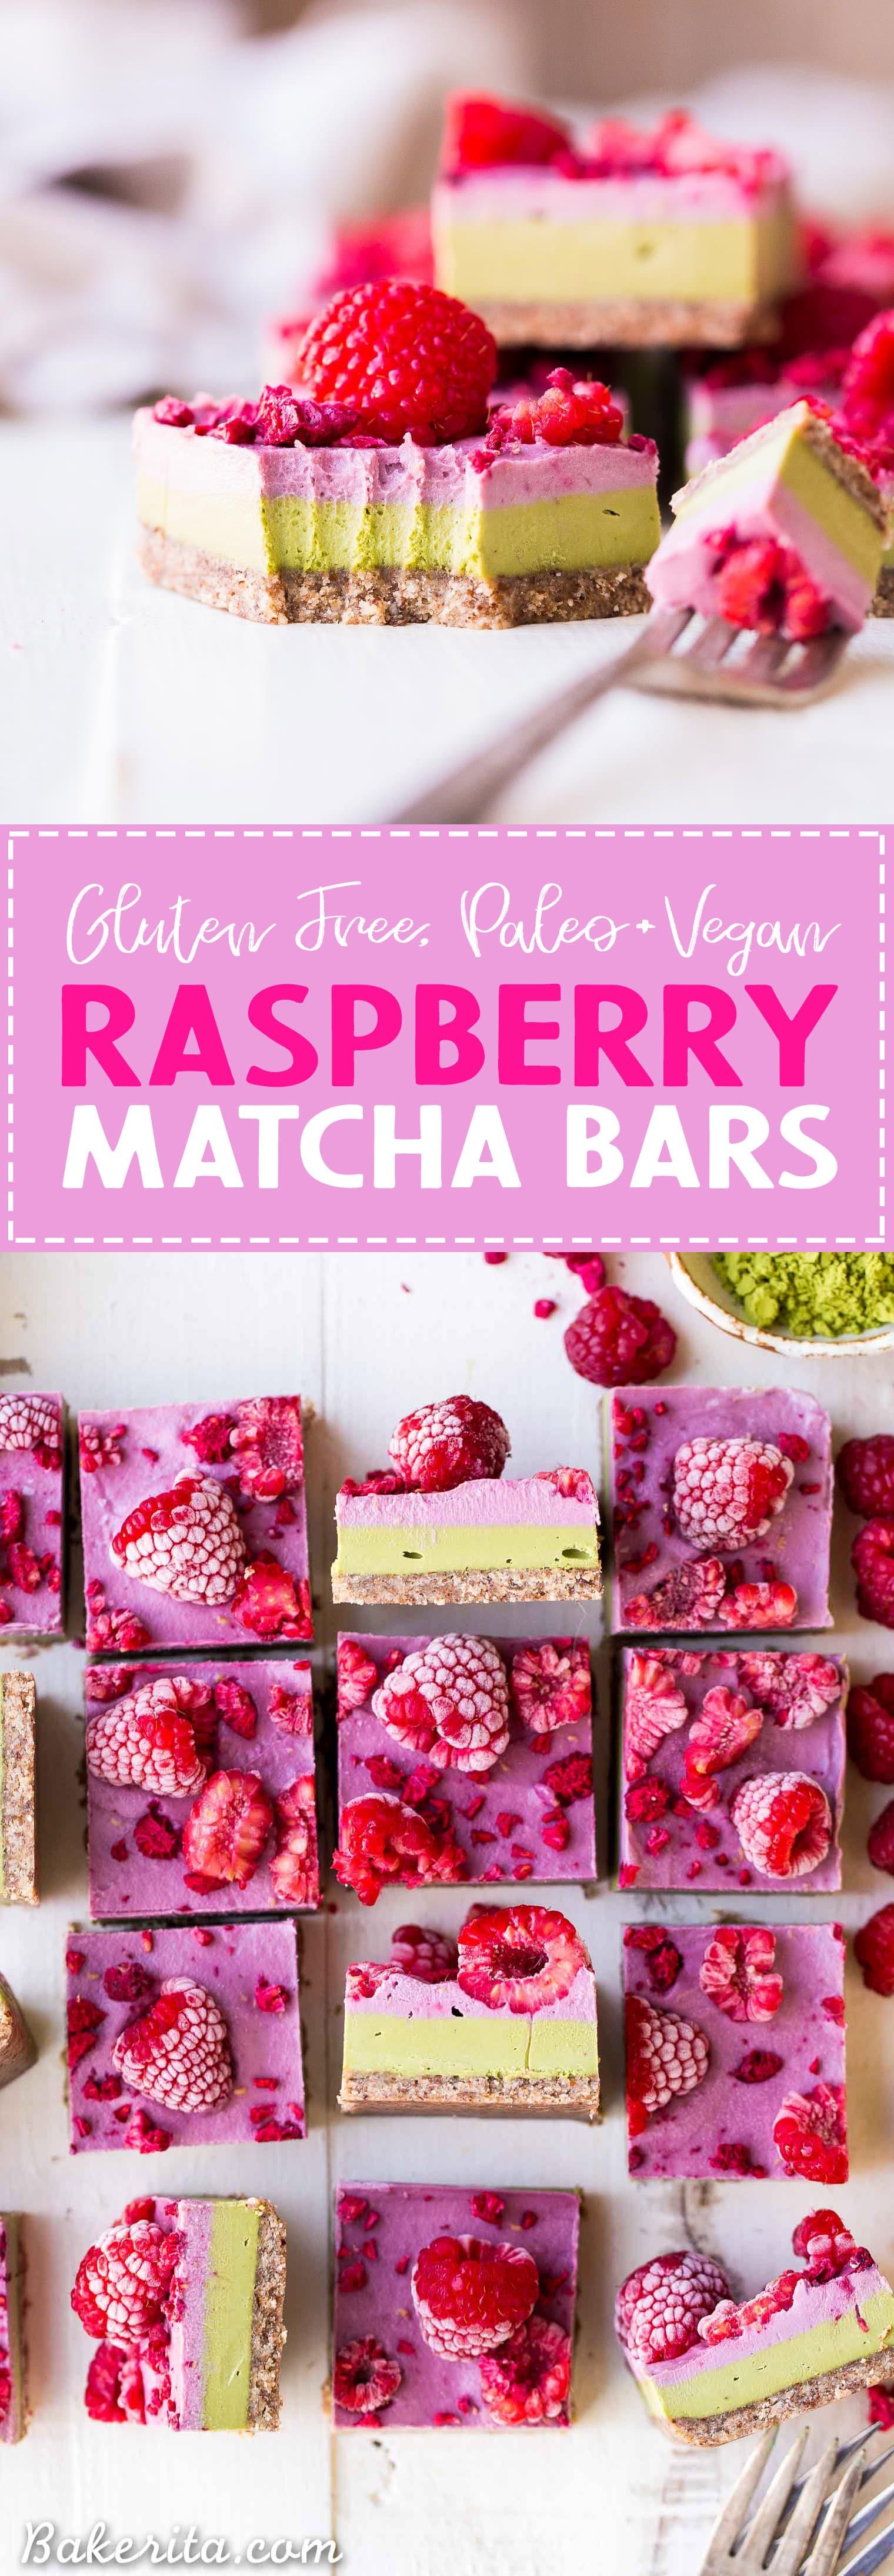 Layered Raspberry Matcha Bars with Text Overlay - Gluten Free, Paleo, Refined Sugar Free, Dairy Free & Vegan Dessert